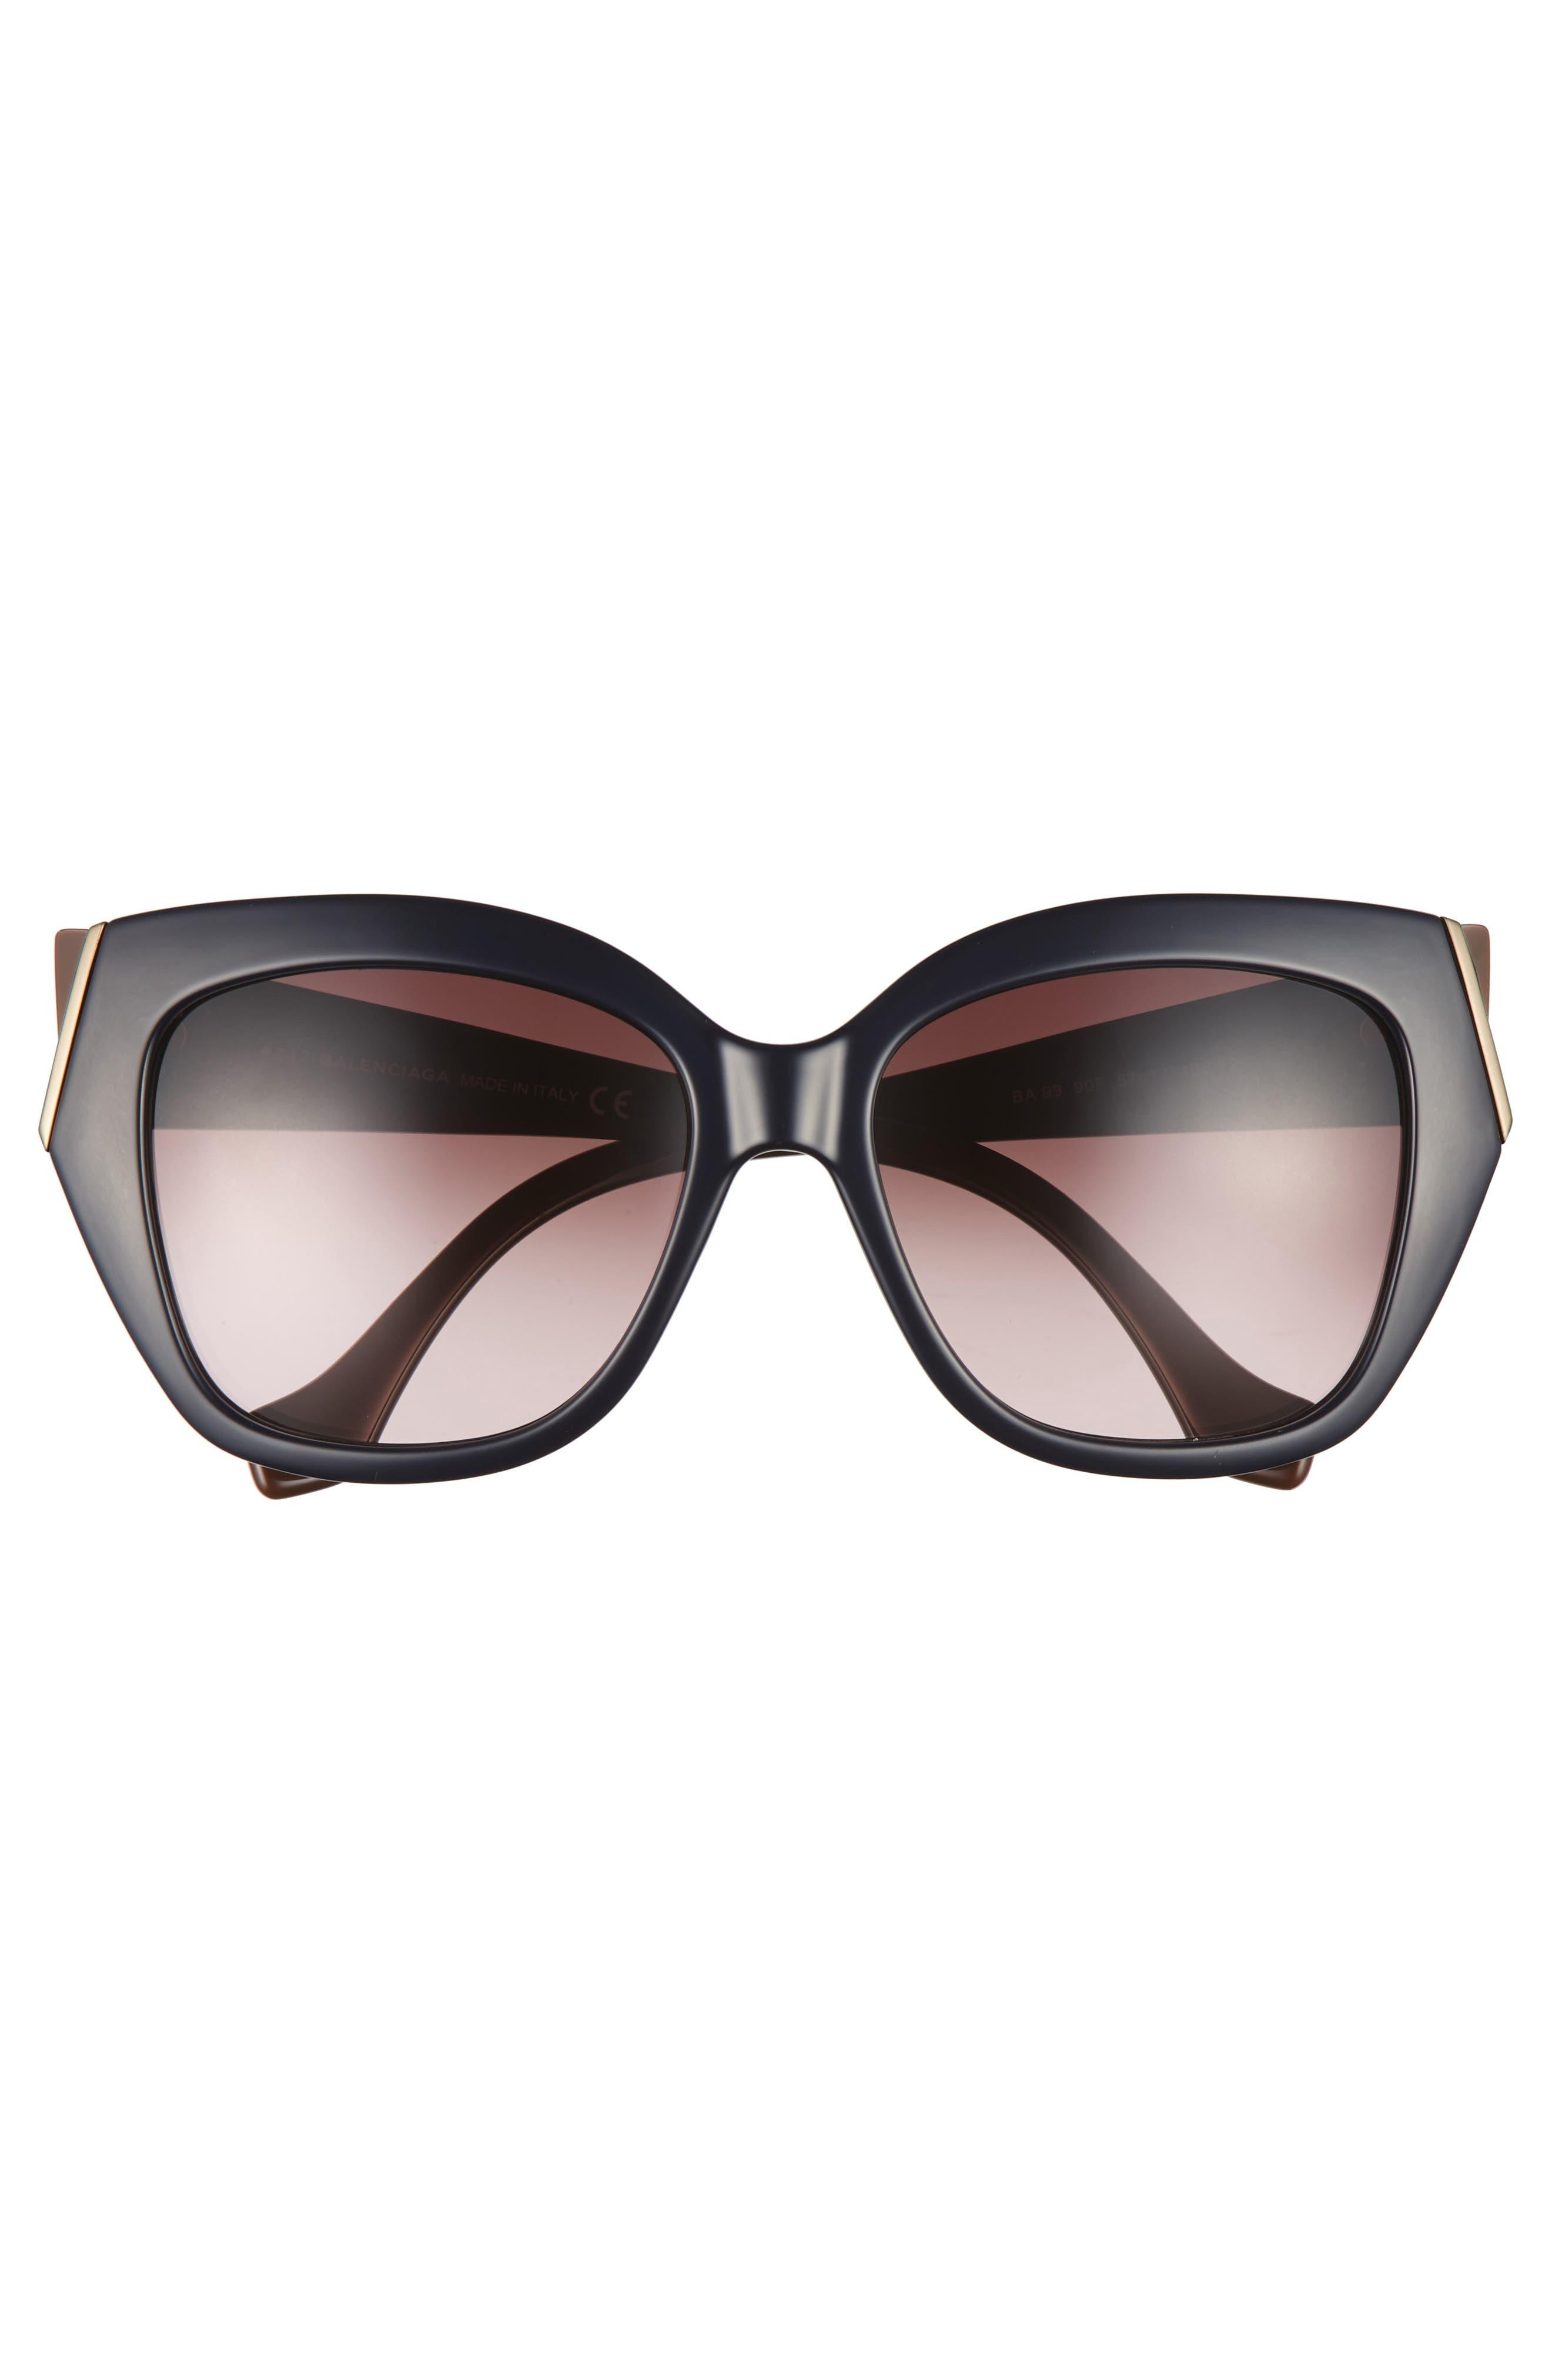 57mm Cat Eye Sunglasses,                             Alternate thumbnail 3, color,                             Shiny Blue/ Gradient Brown